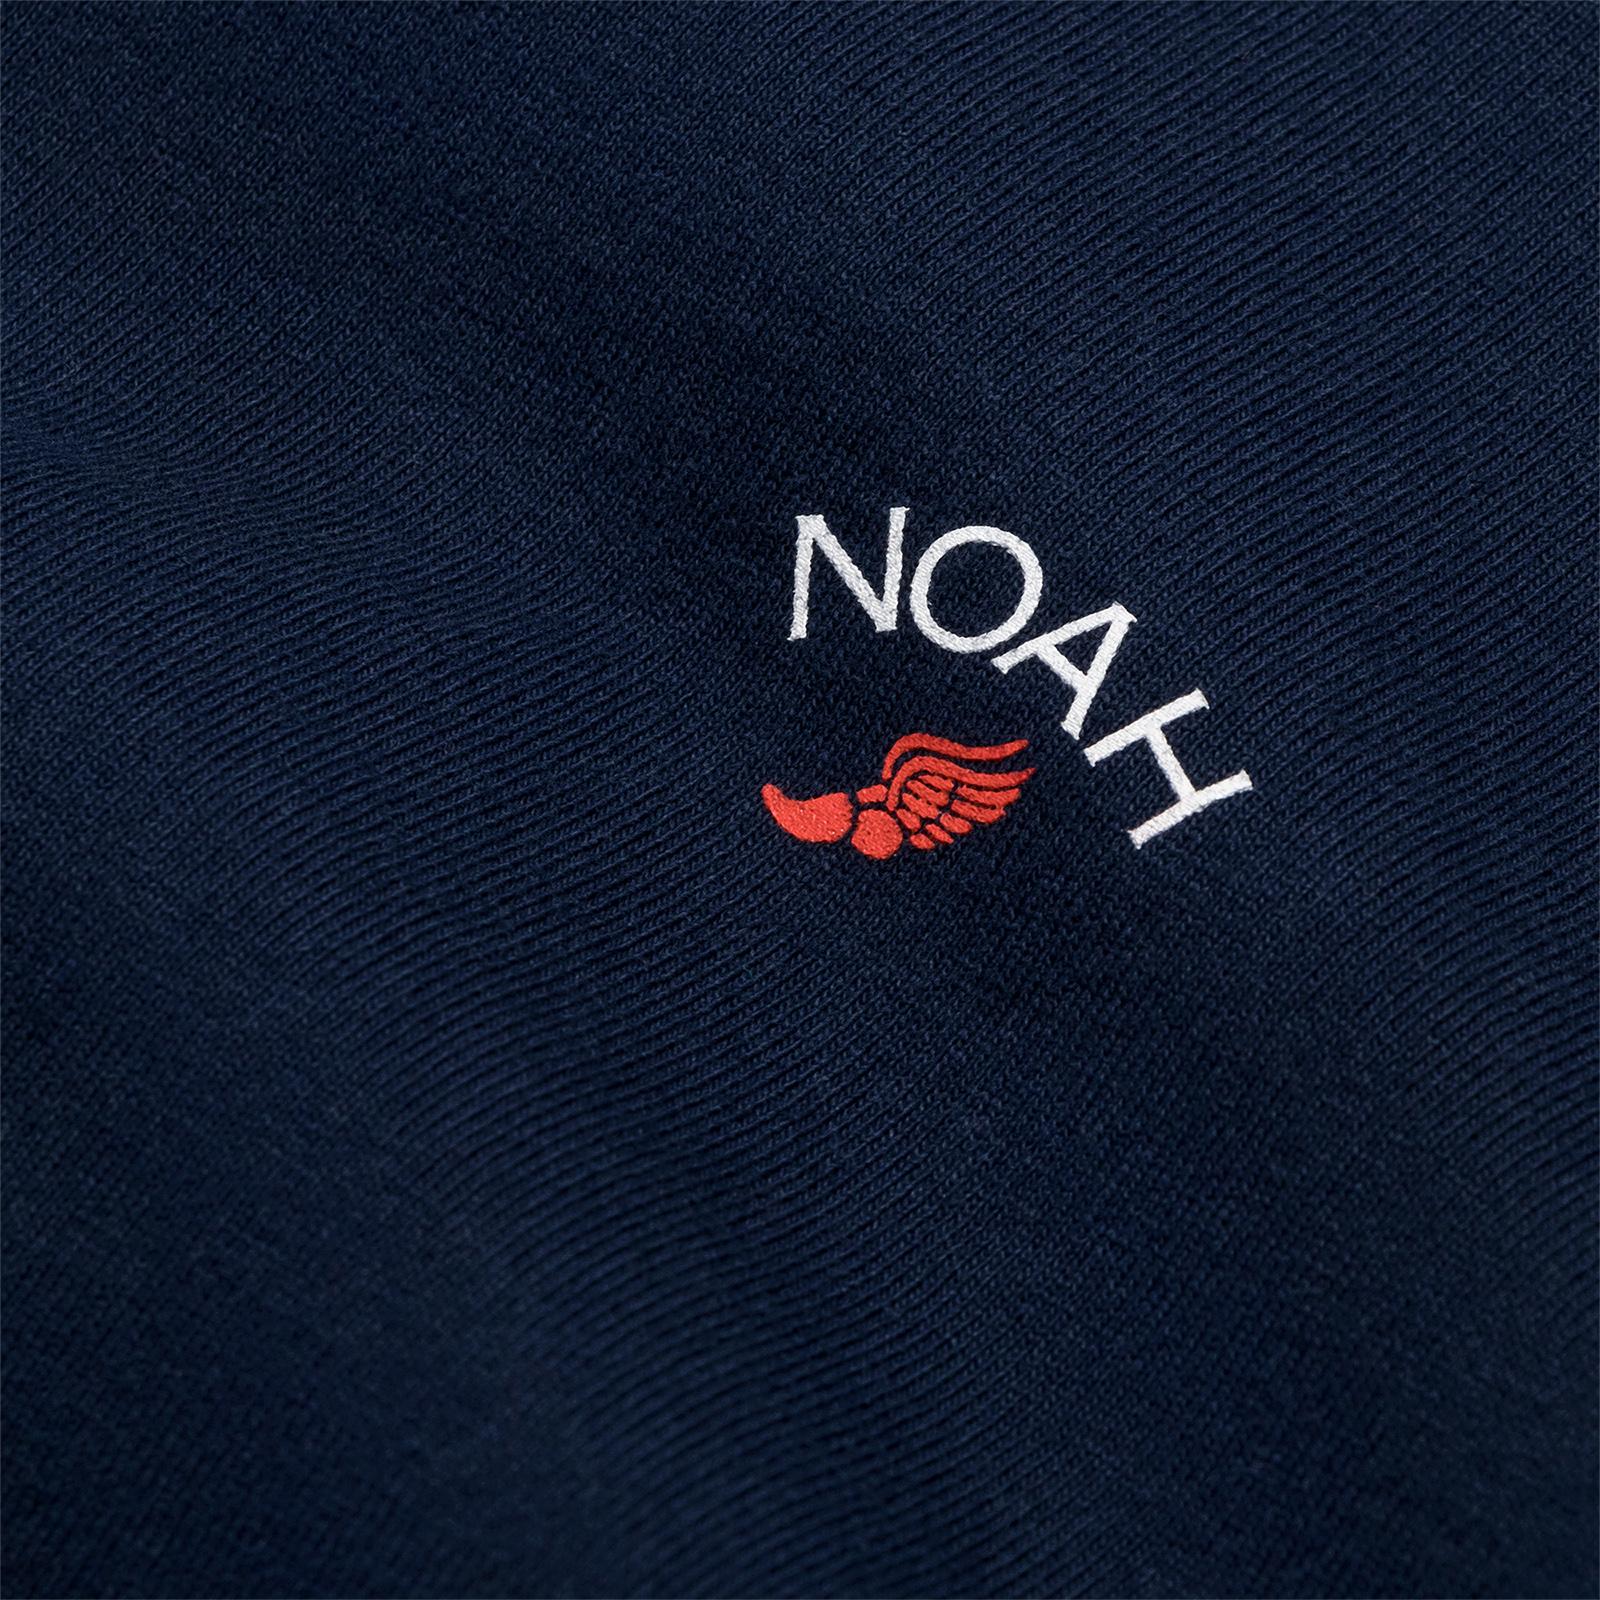 Logo close up product photography